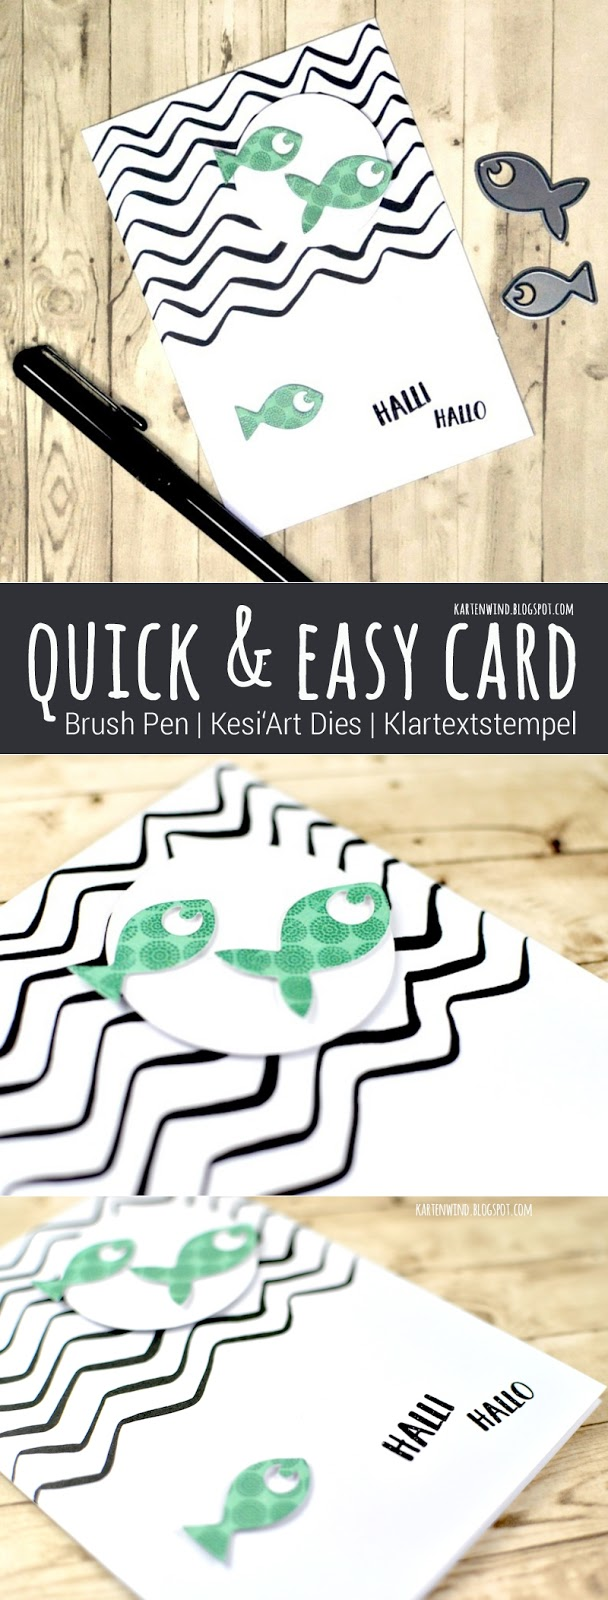 https://kartenwind.blogspot.com/2017/08/quick-easy-chevron-karte-mit-brush-pen.html